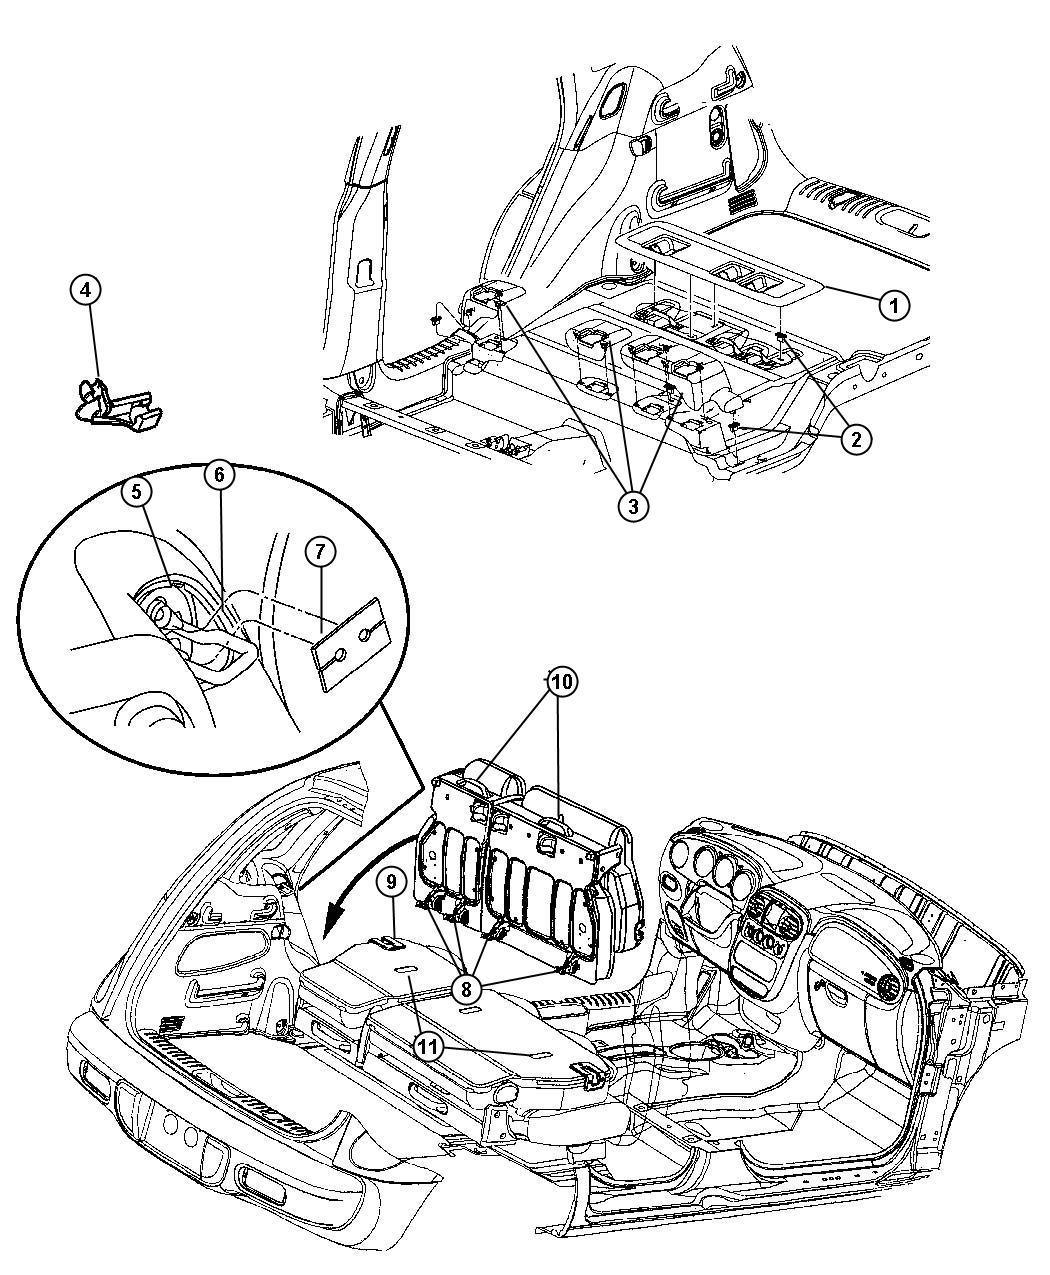 Chrysler Pt Cruiser Bezel Seat Latch Da Da